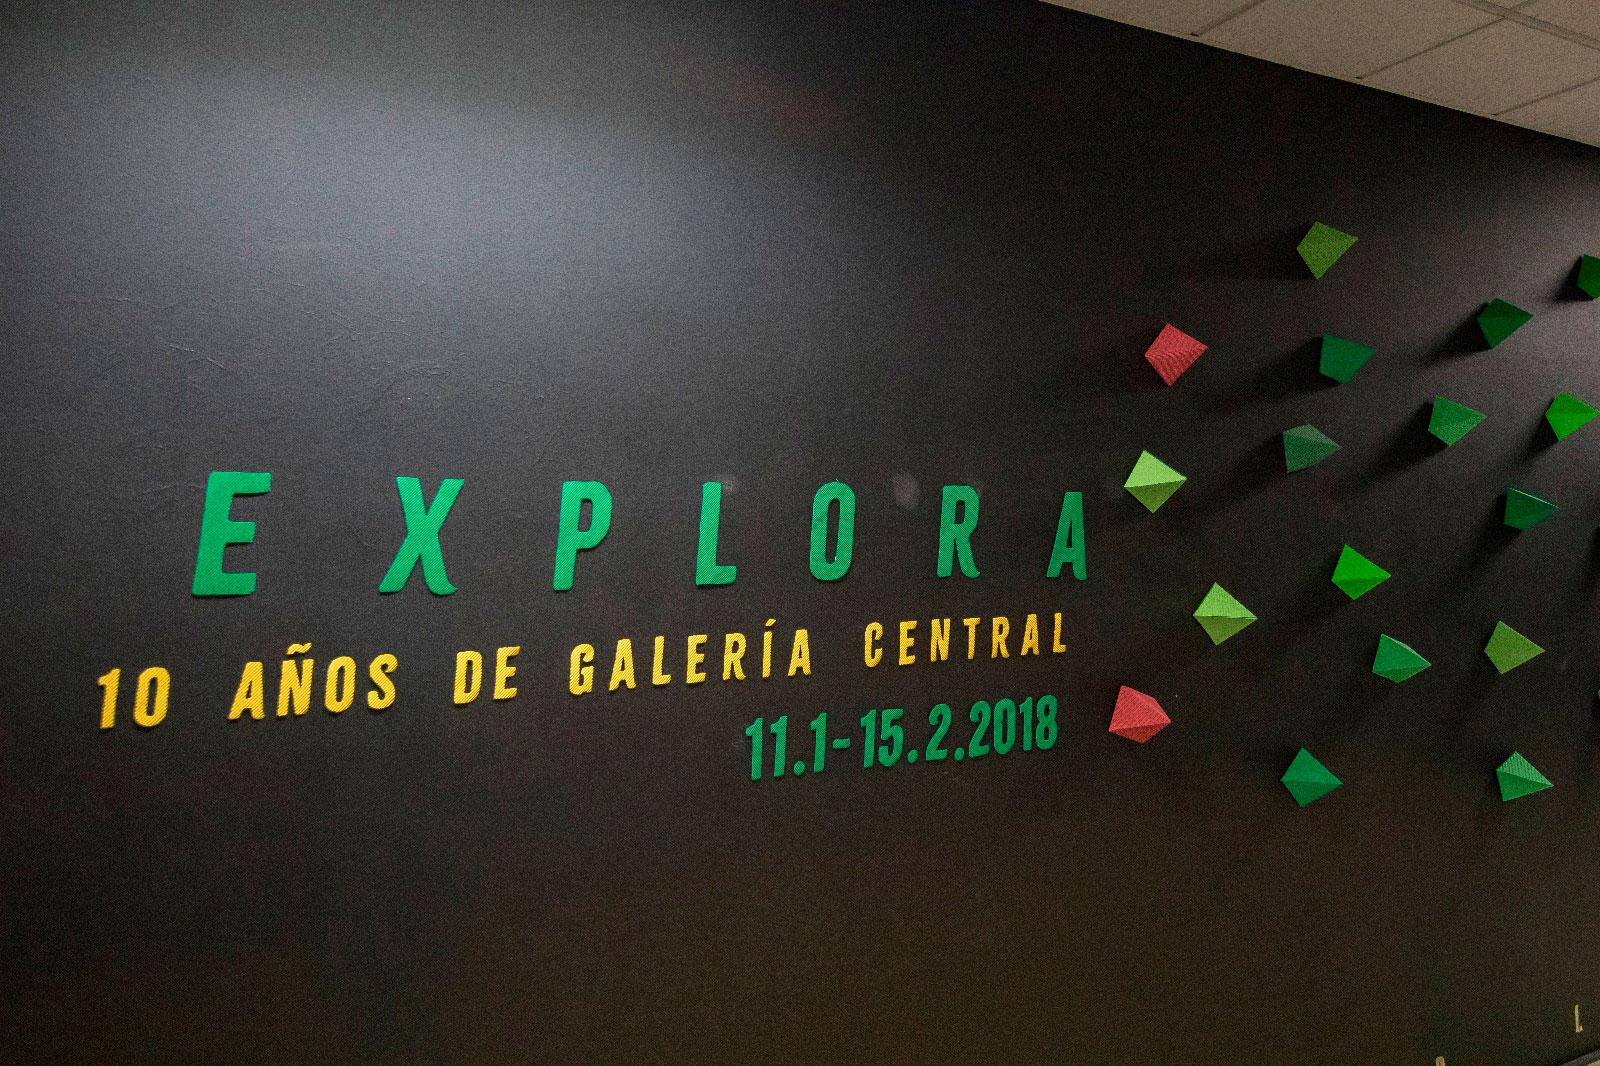 Décimo aniversario de Galería Central con exposición retrospectiva